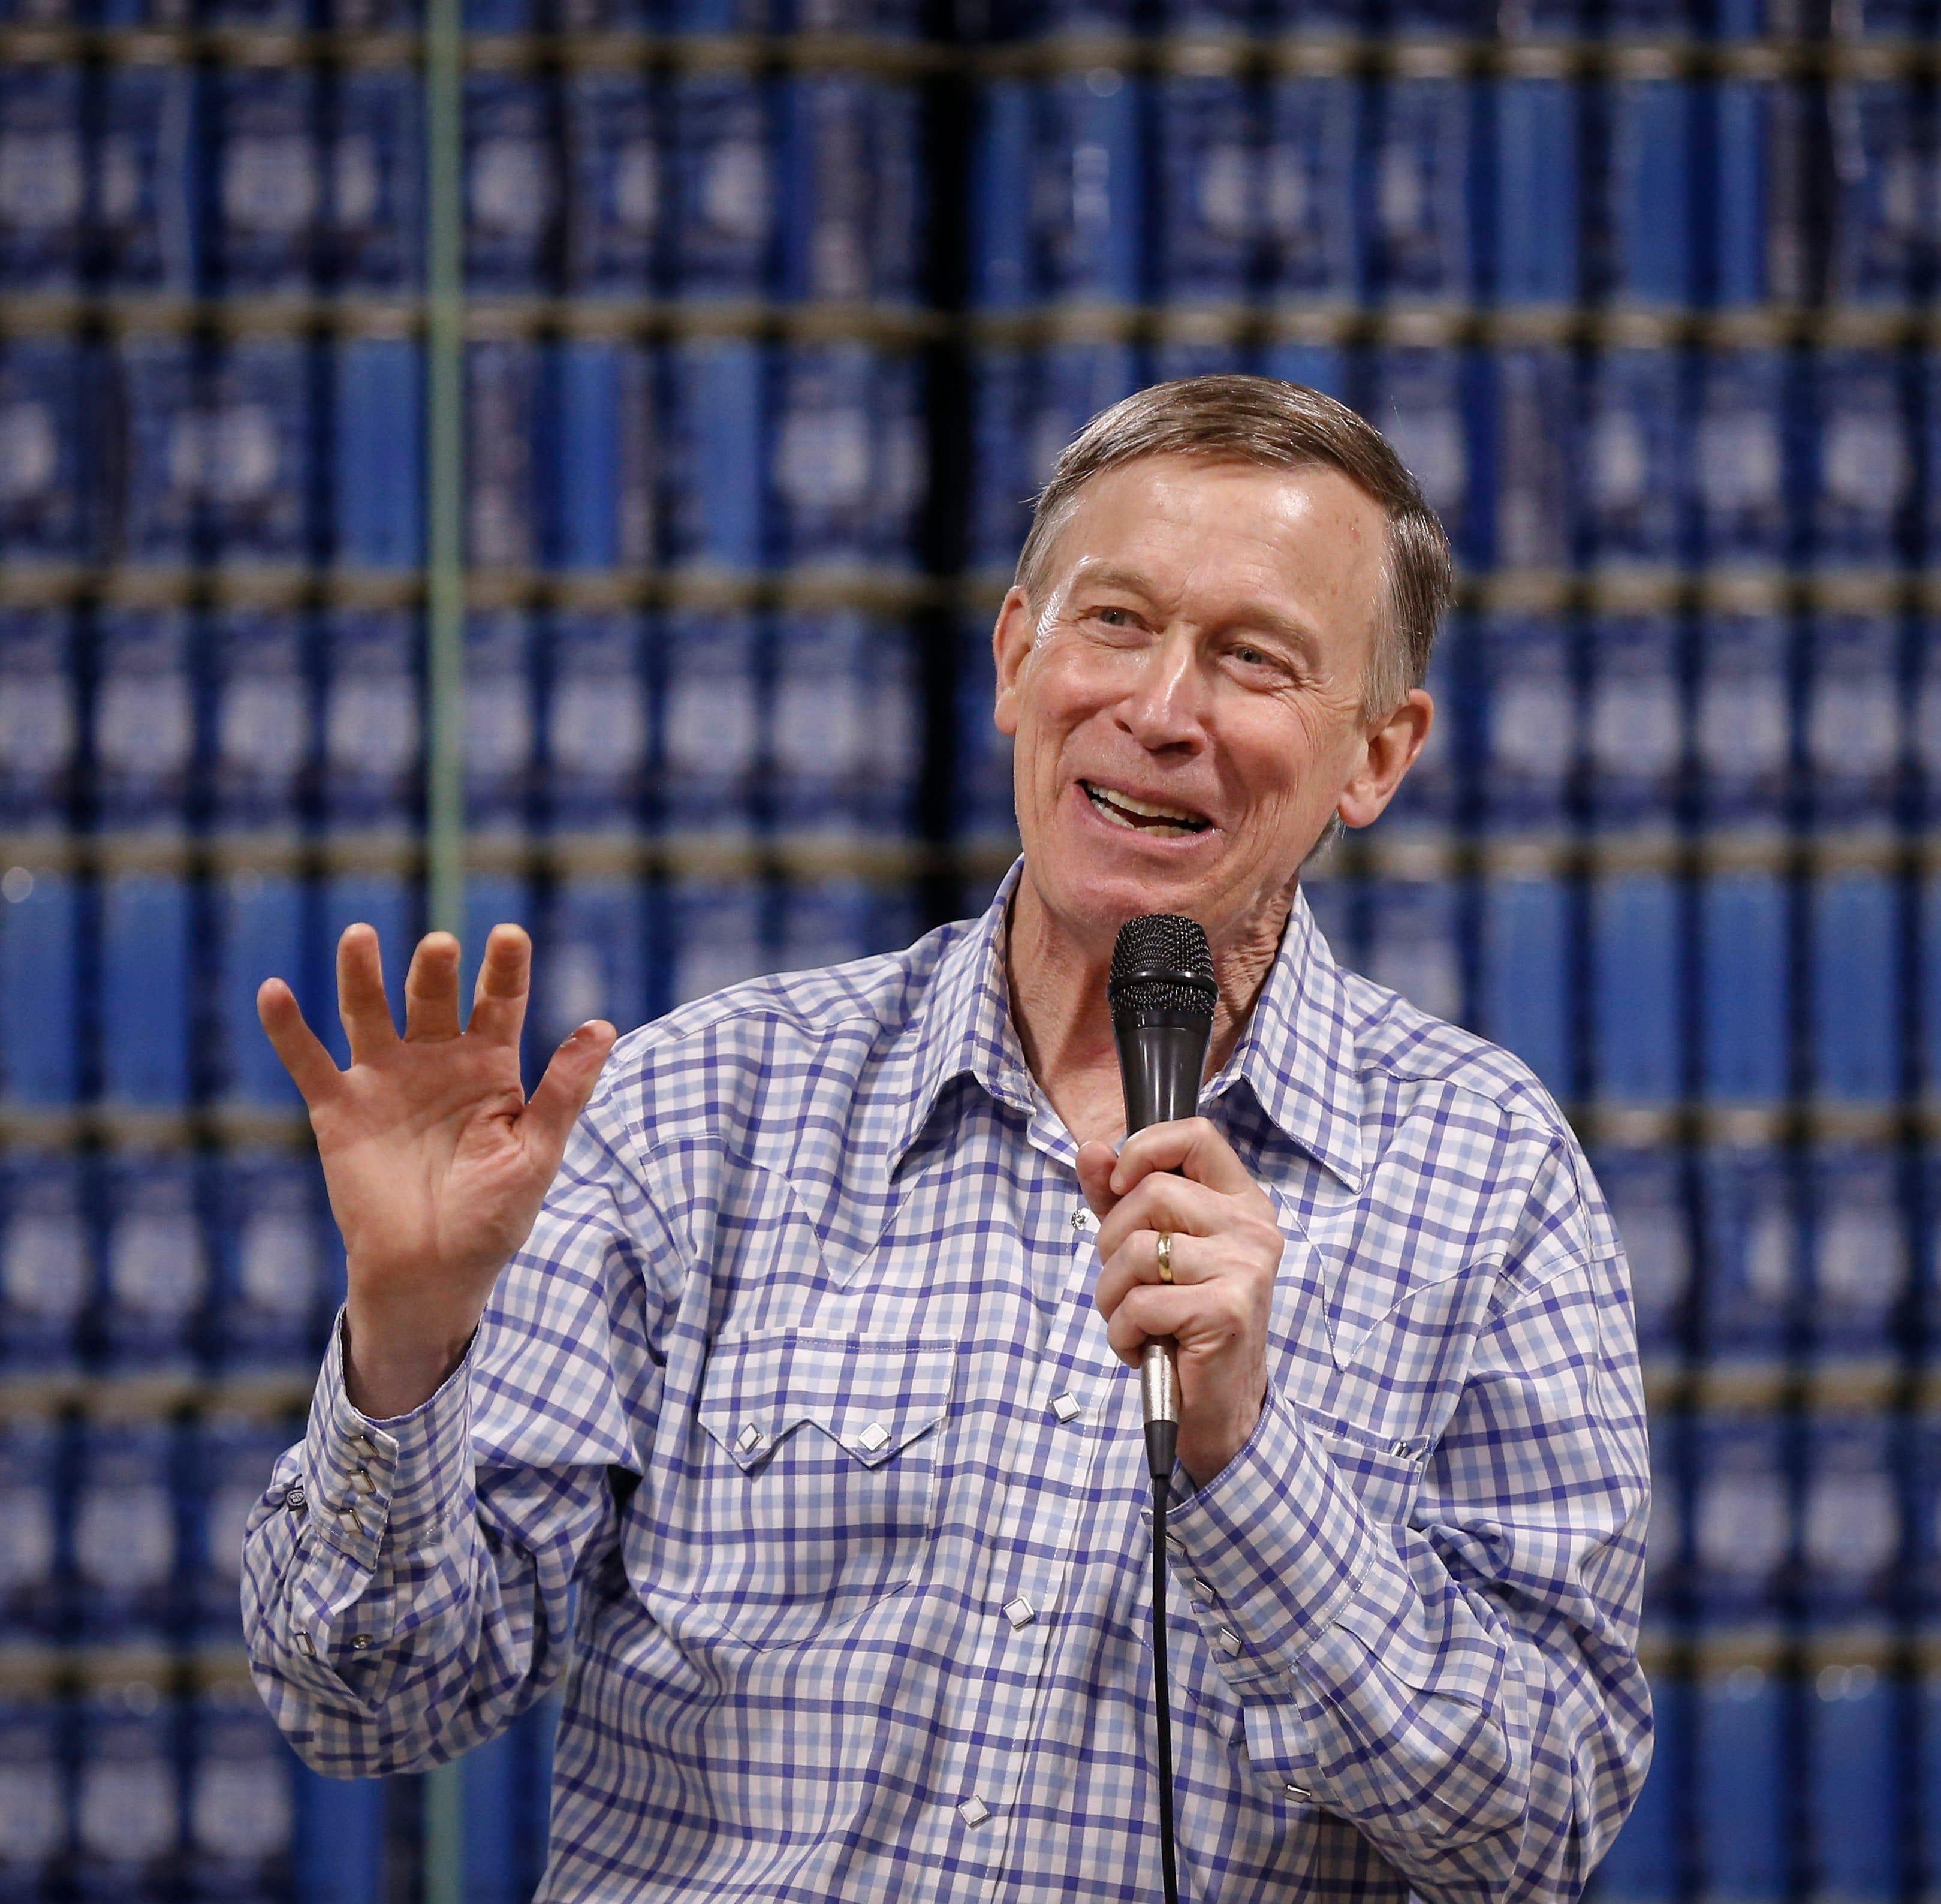 Iowa caucuses 2020: Folksy John Hickenlooper pledges to crisscross state, talking collaboration